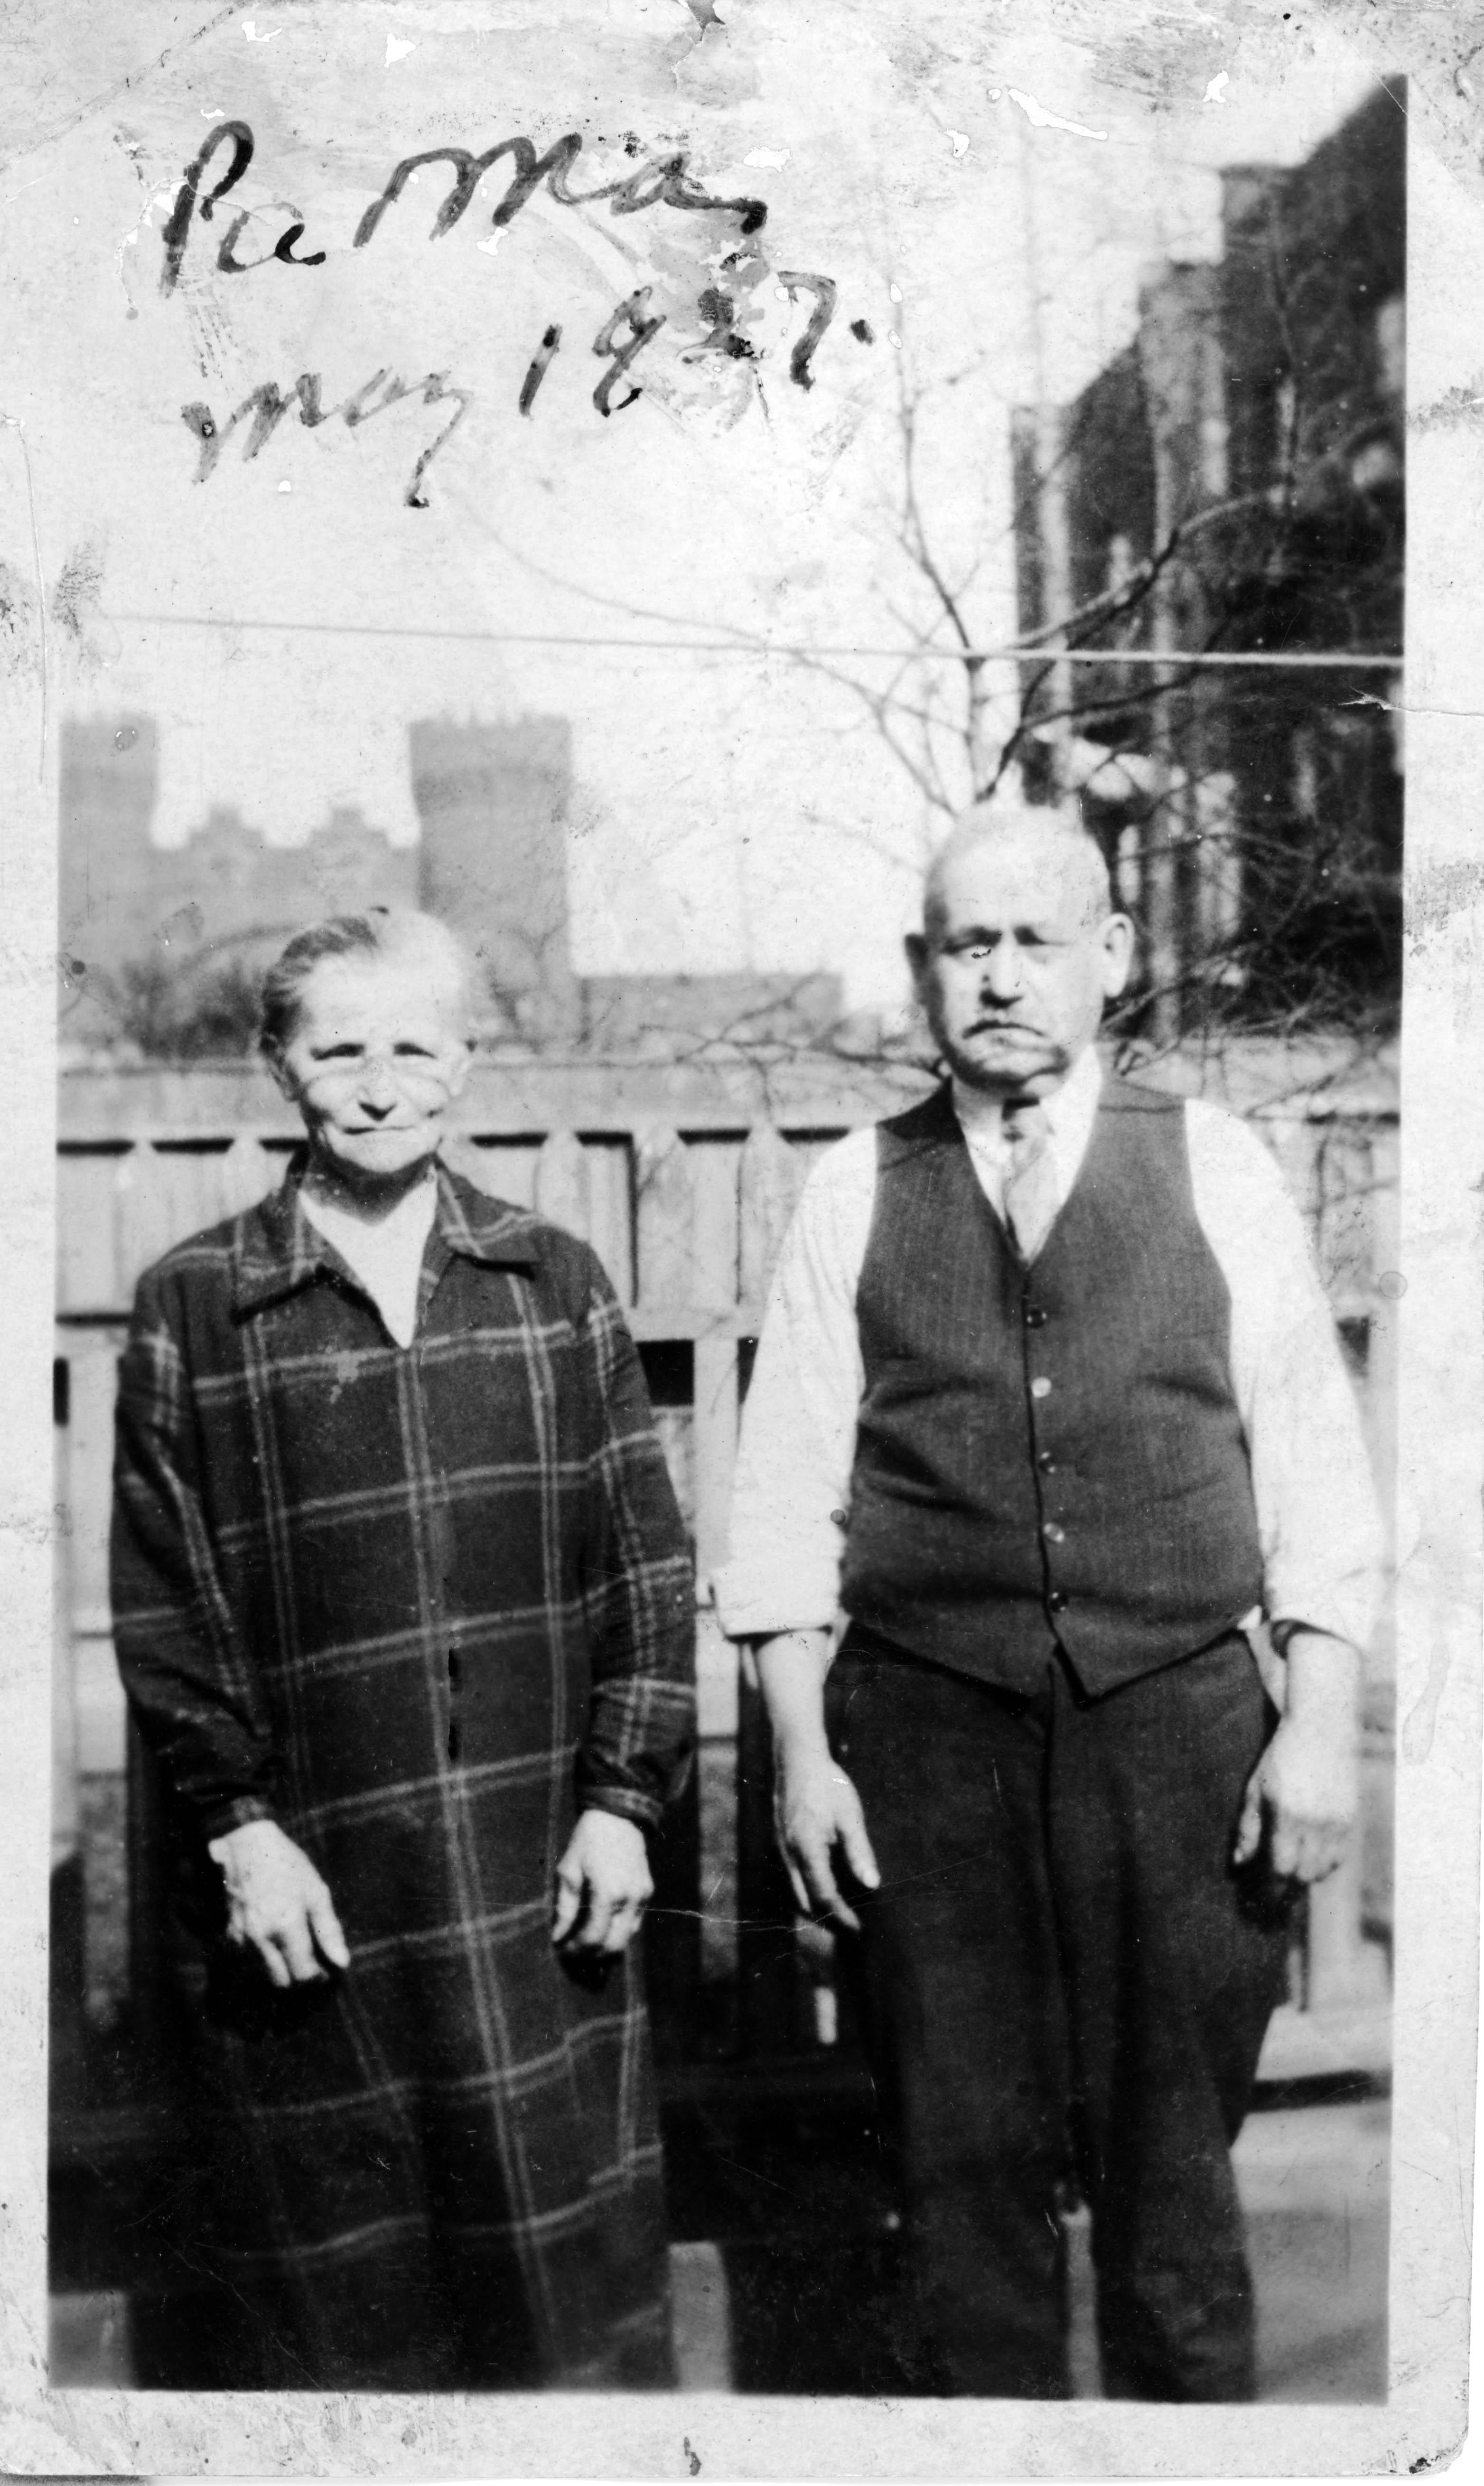 Israel (Sruel) and Milke (Weisler) Strober on rooftop, presumably in Brooklyn, NY, in 1927.